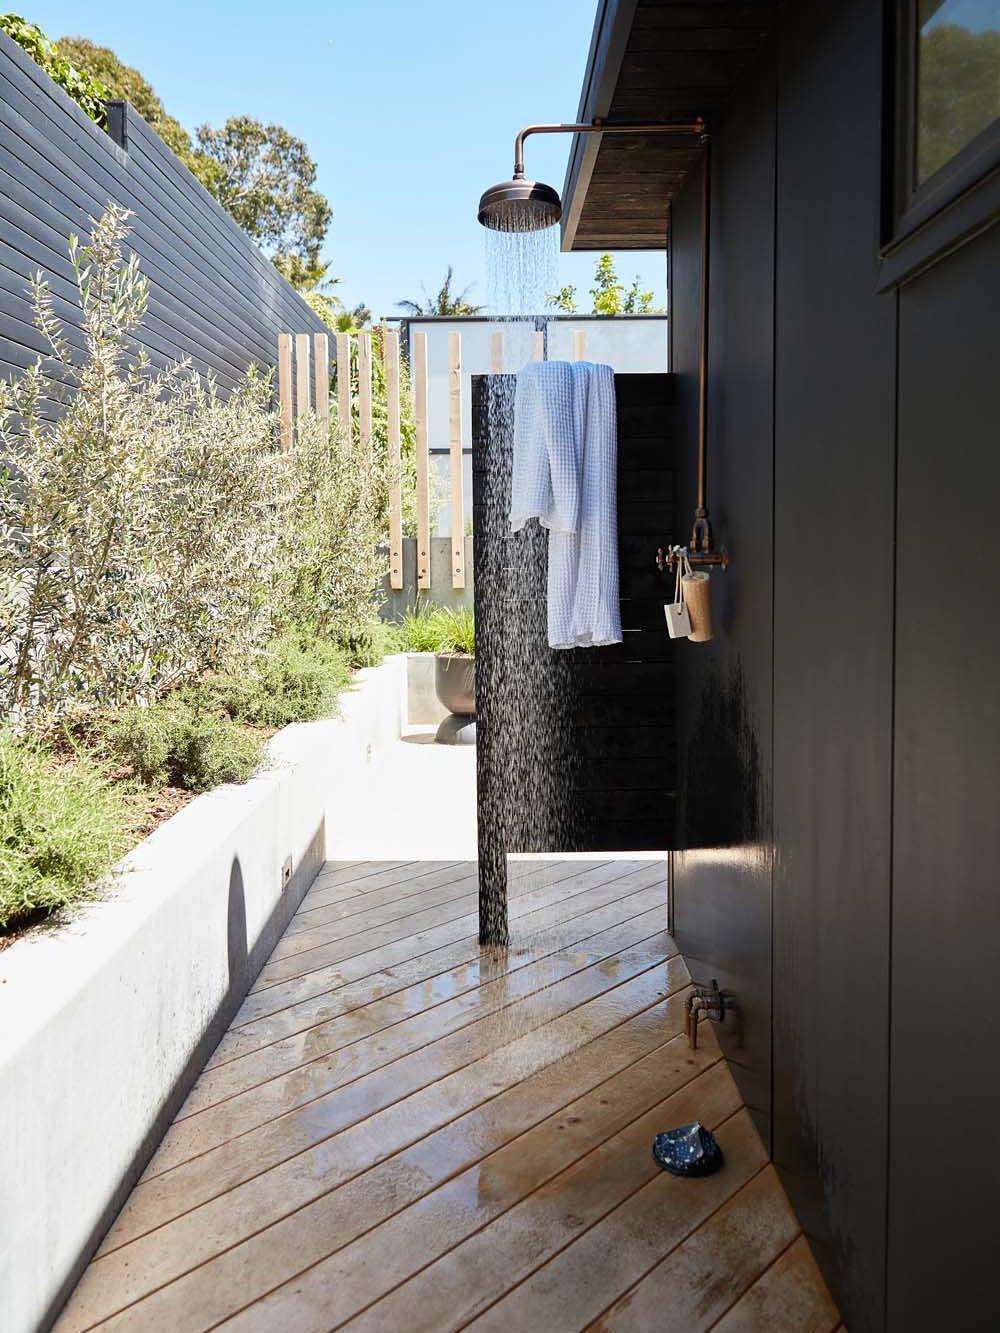 Erin Hiemstra's outdoor shower